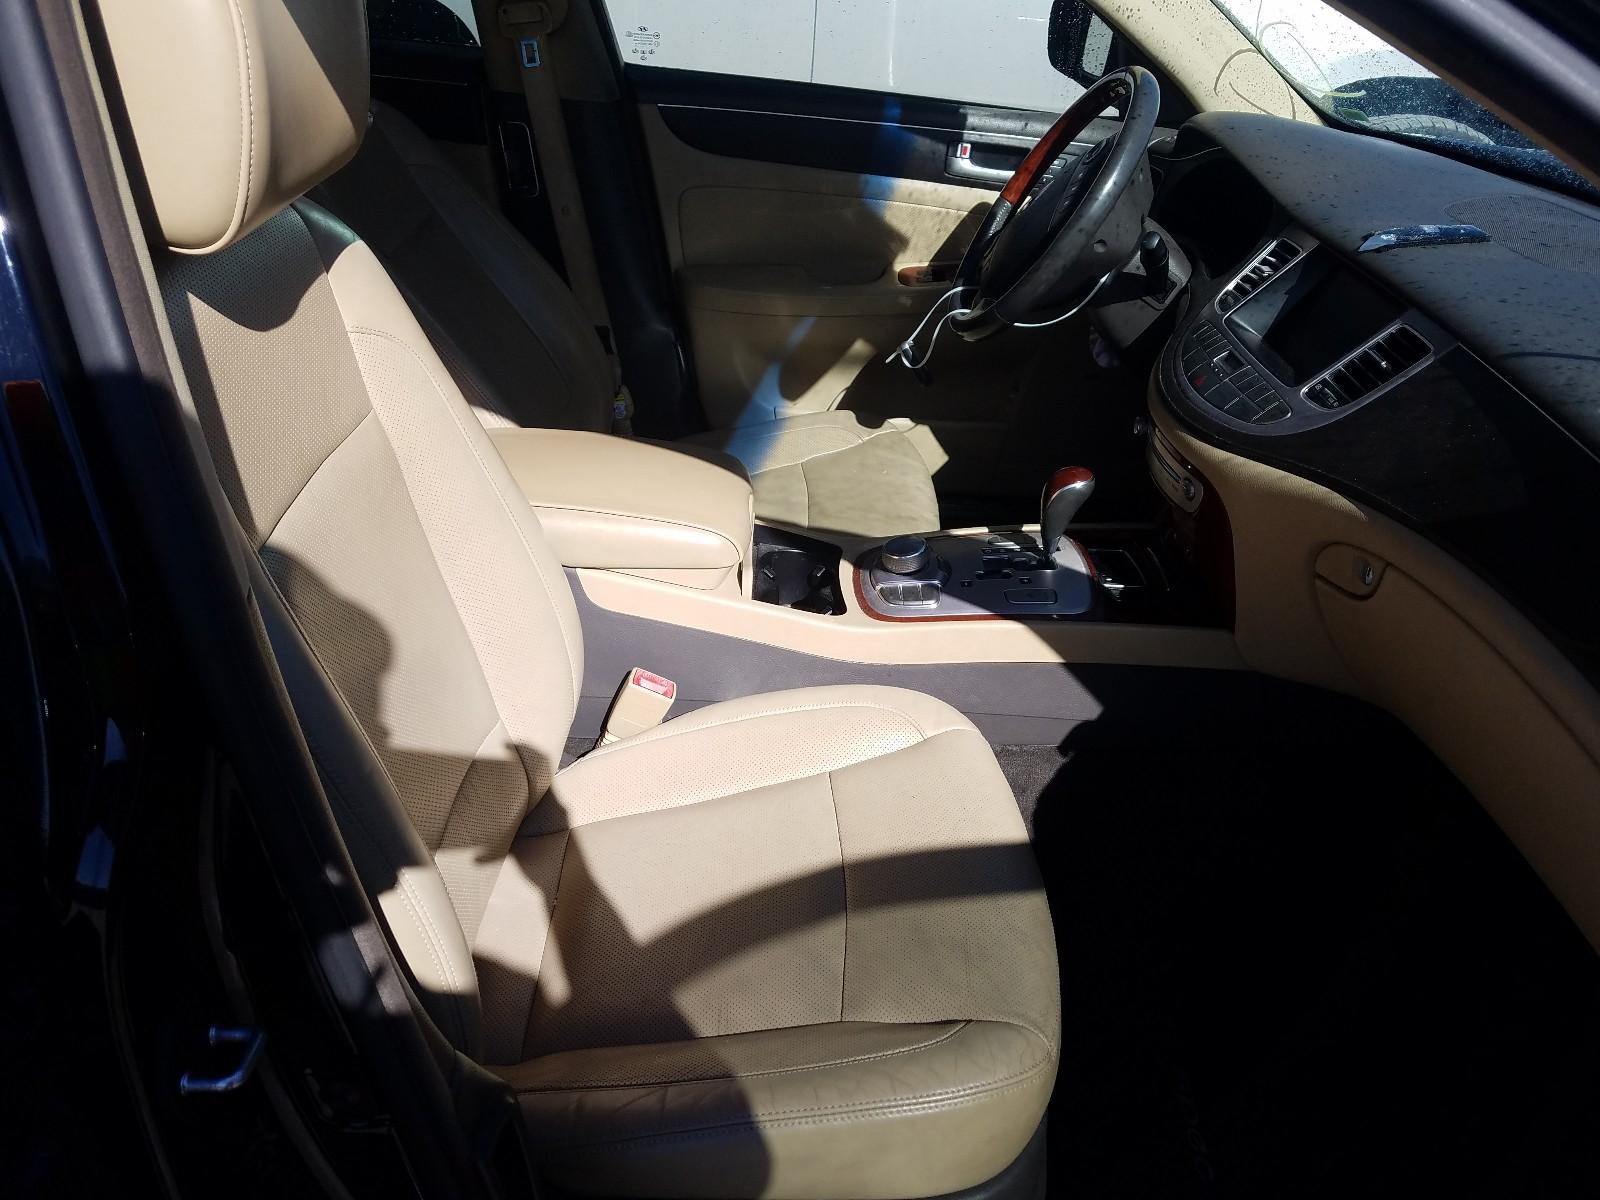 2012 Hyundai Genesis 4. 4.6L close up View